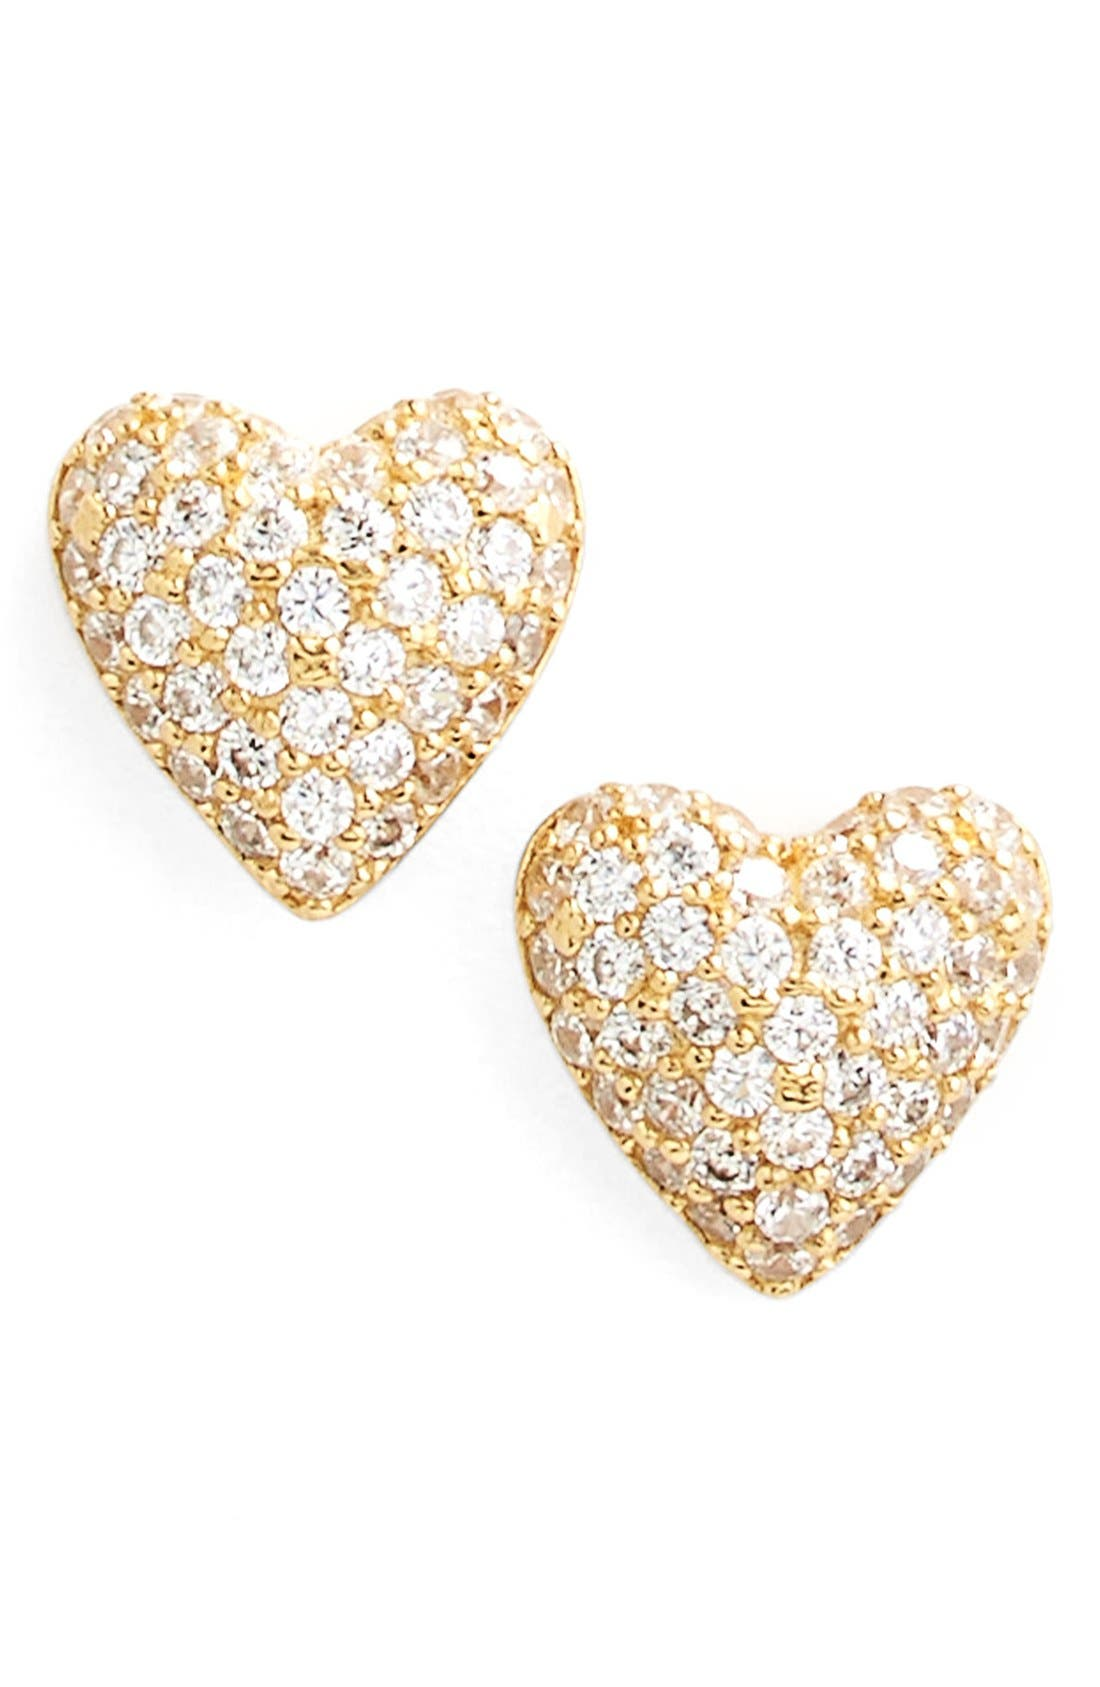 Main Image - Nadri 'Valentine's Day' Heart Stud Earrings